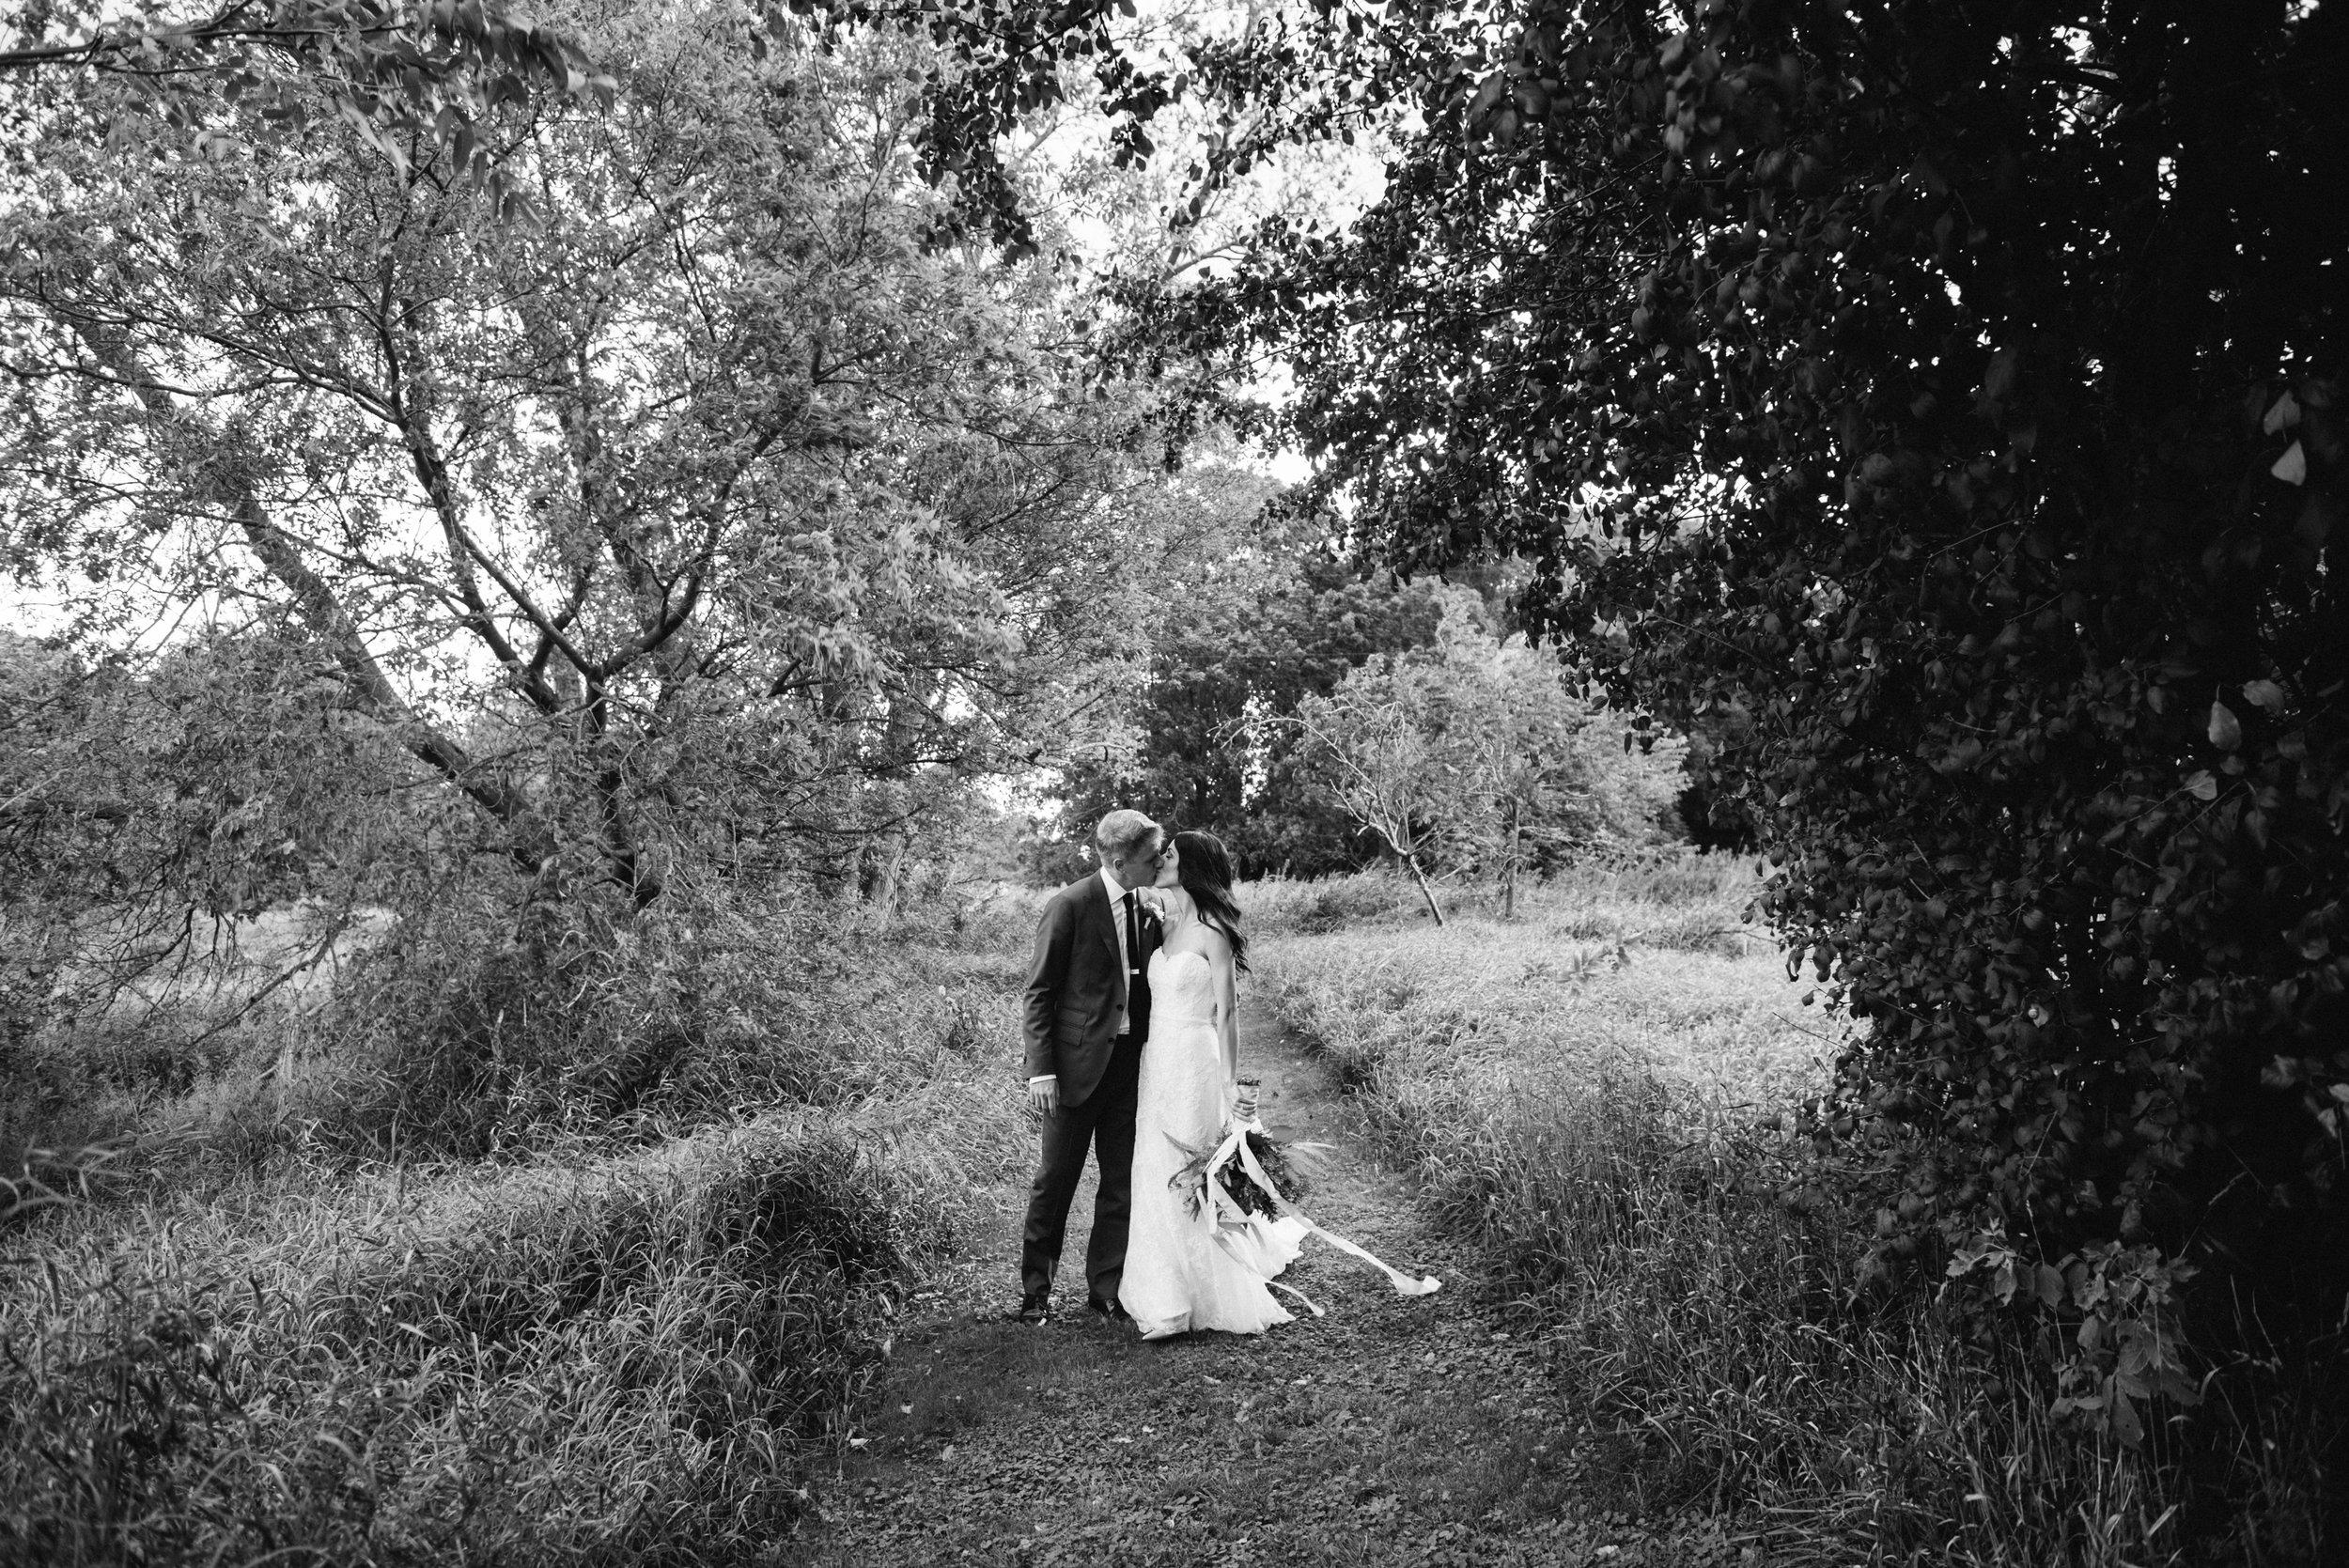 bride-groom-nature-photography-black-white